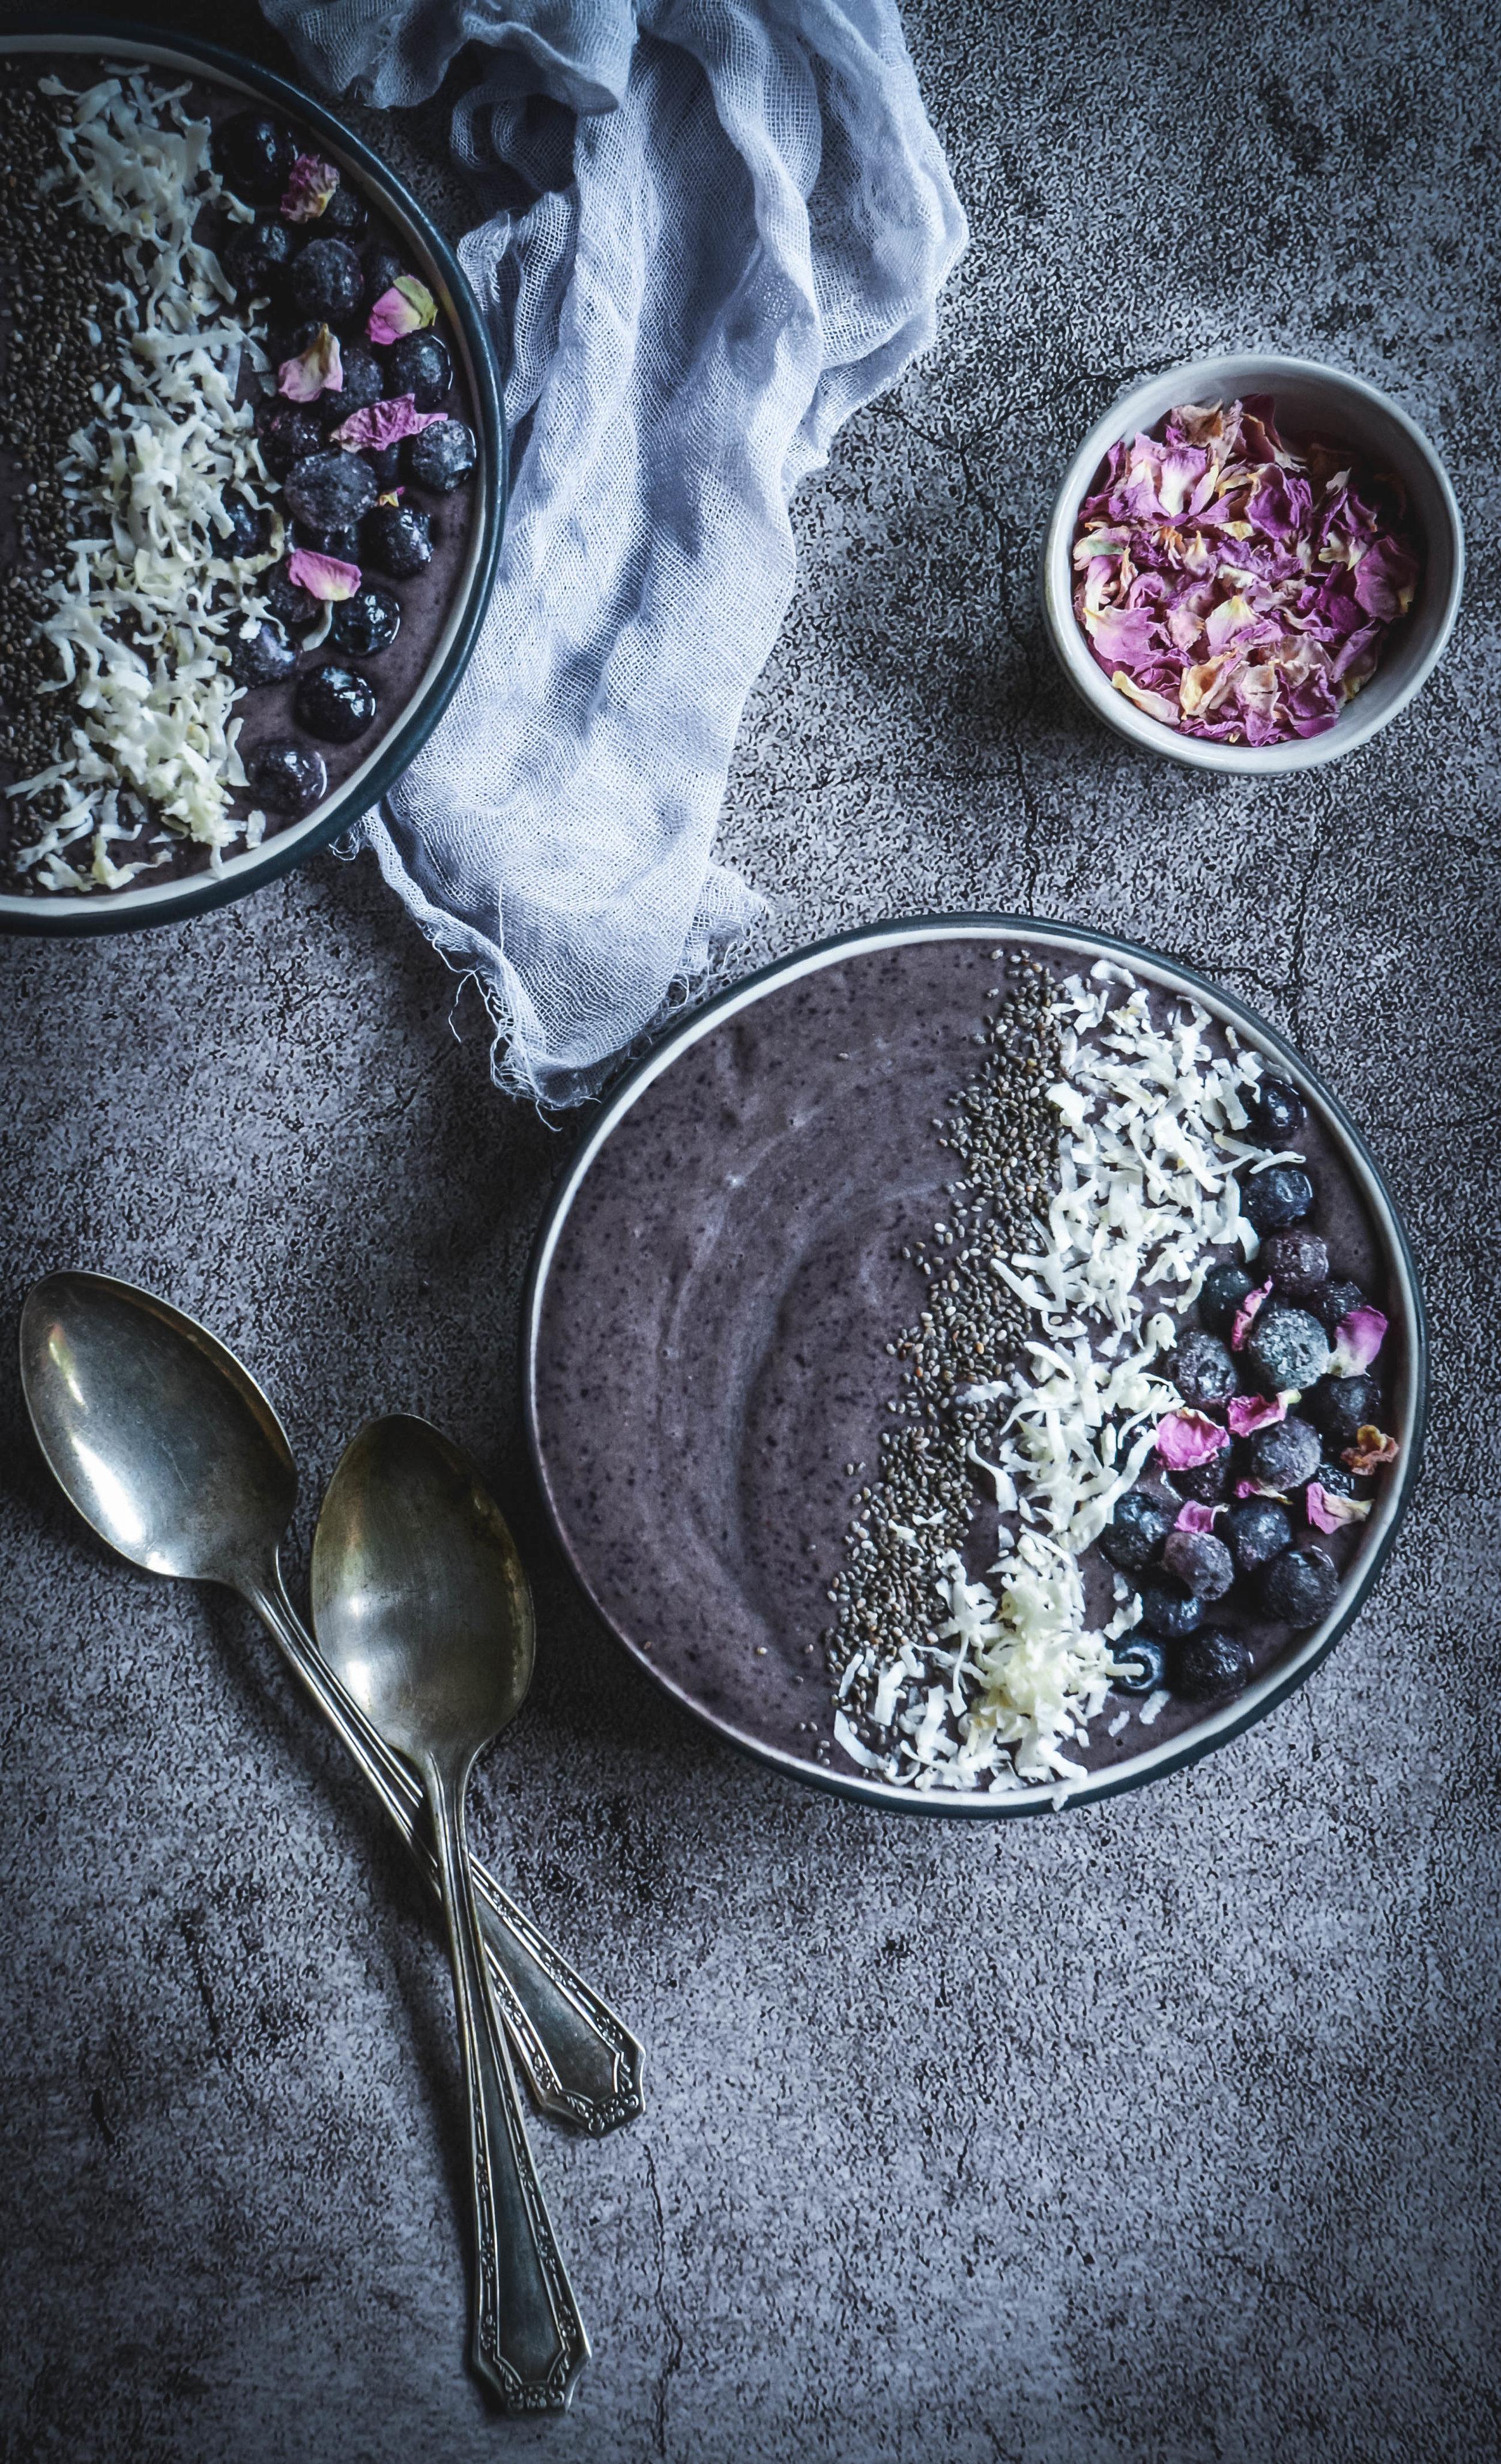 Smoothie bowls, napkin, two spoons, rose petal bowl